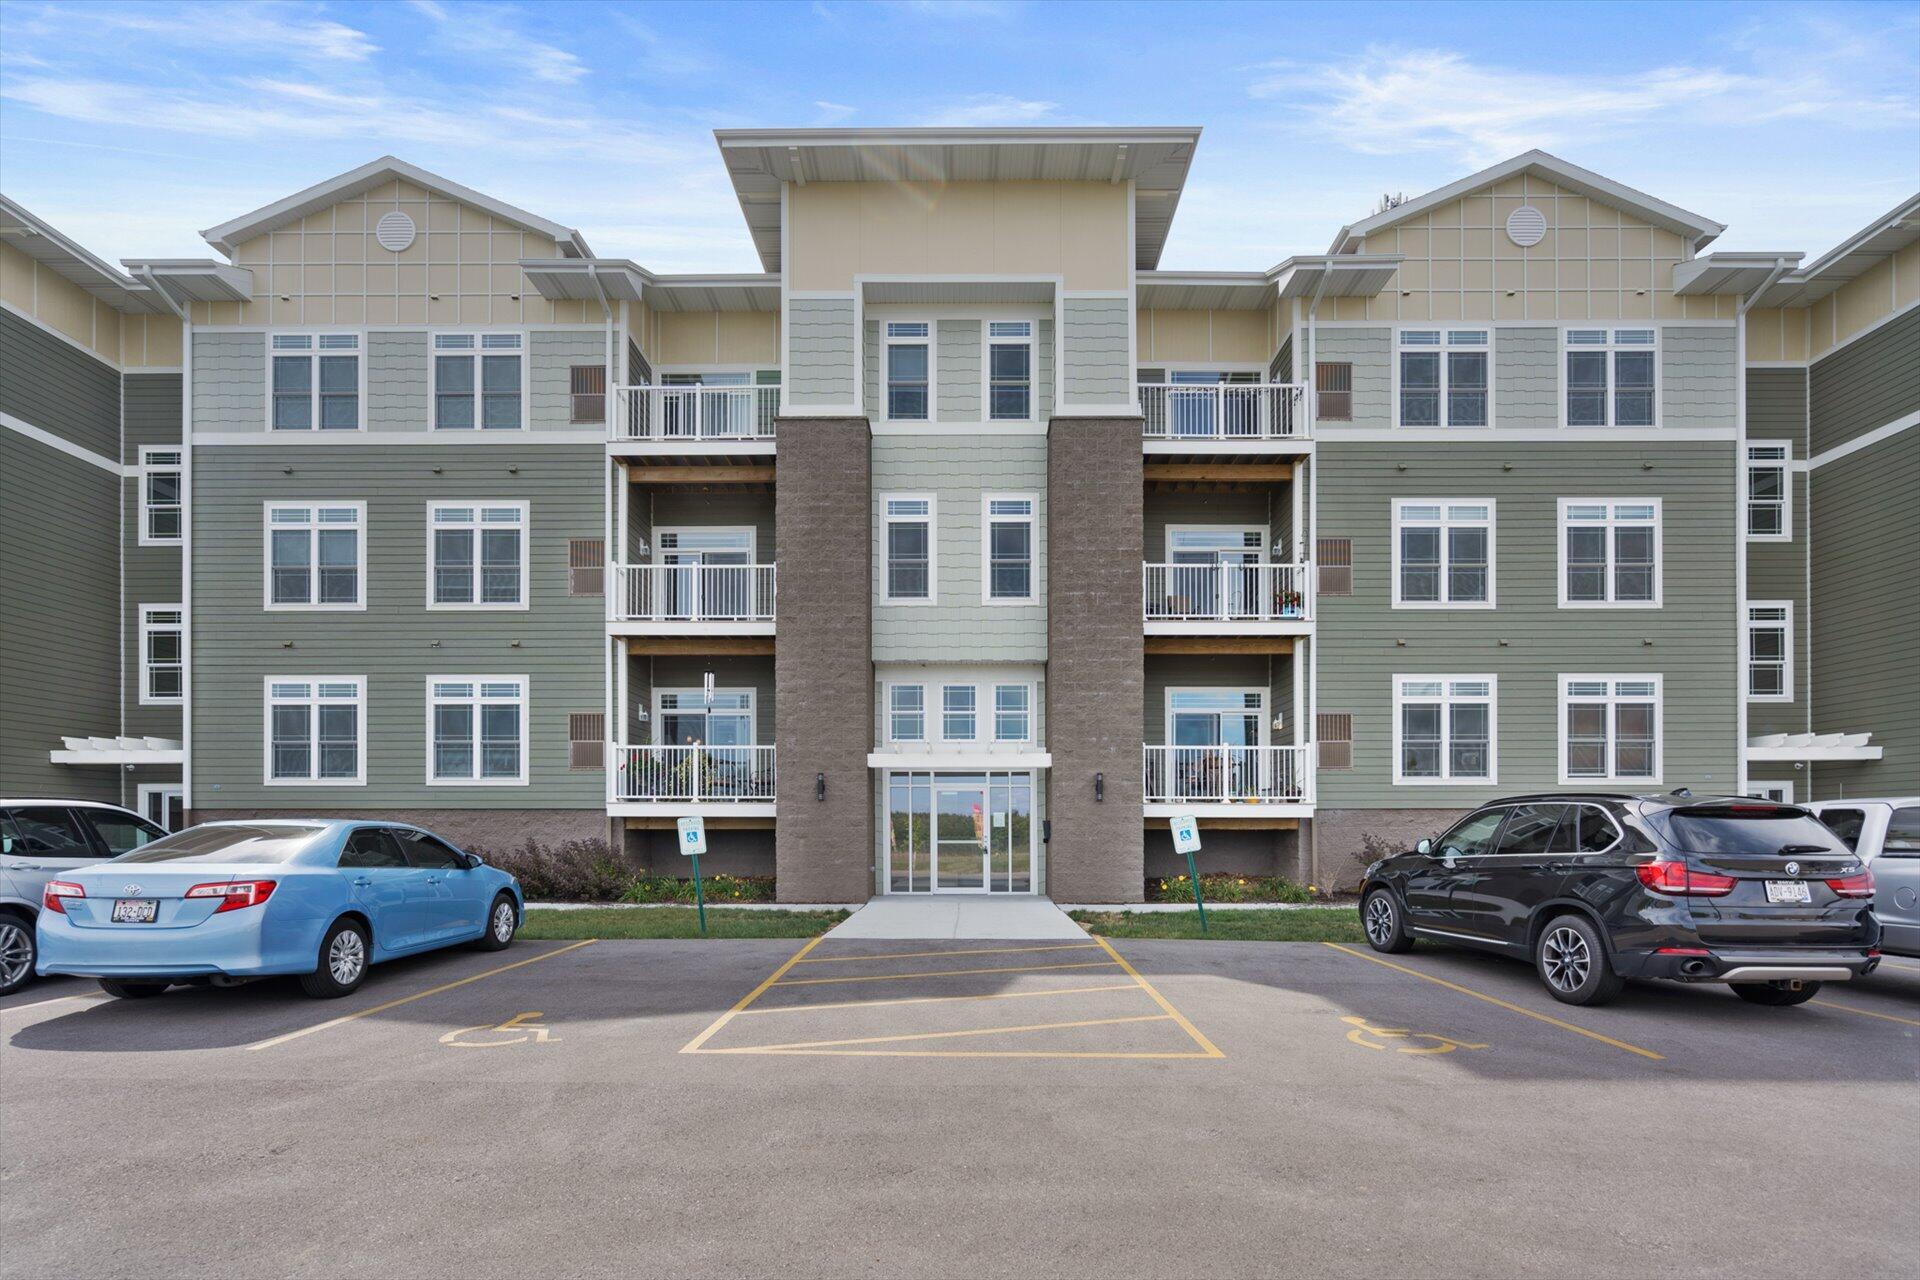 265 Thurow Dr, Oconomowoc, Wisconsin 53066, 2 Bedrooms Bedrooms, 6 Rooms Rooms,2 BathroomsBathrooms,Condominiums,For Sale,Thurow Dr,1,1768120